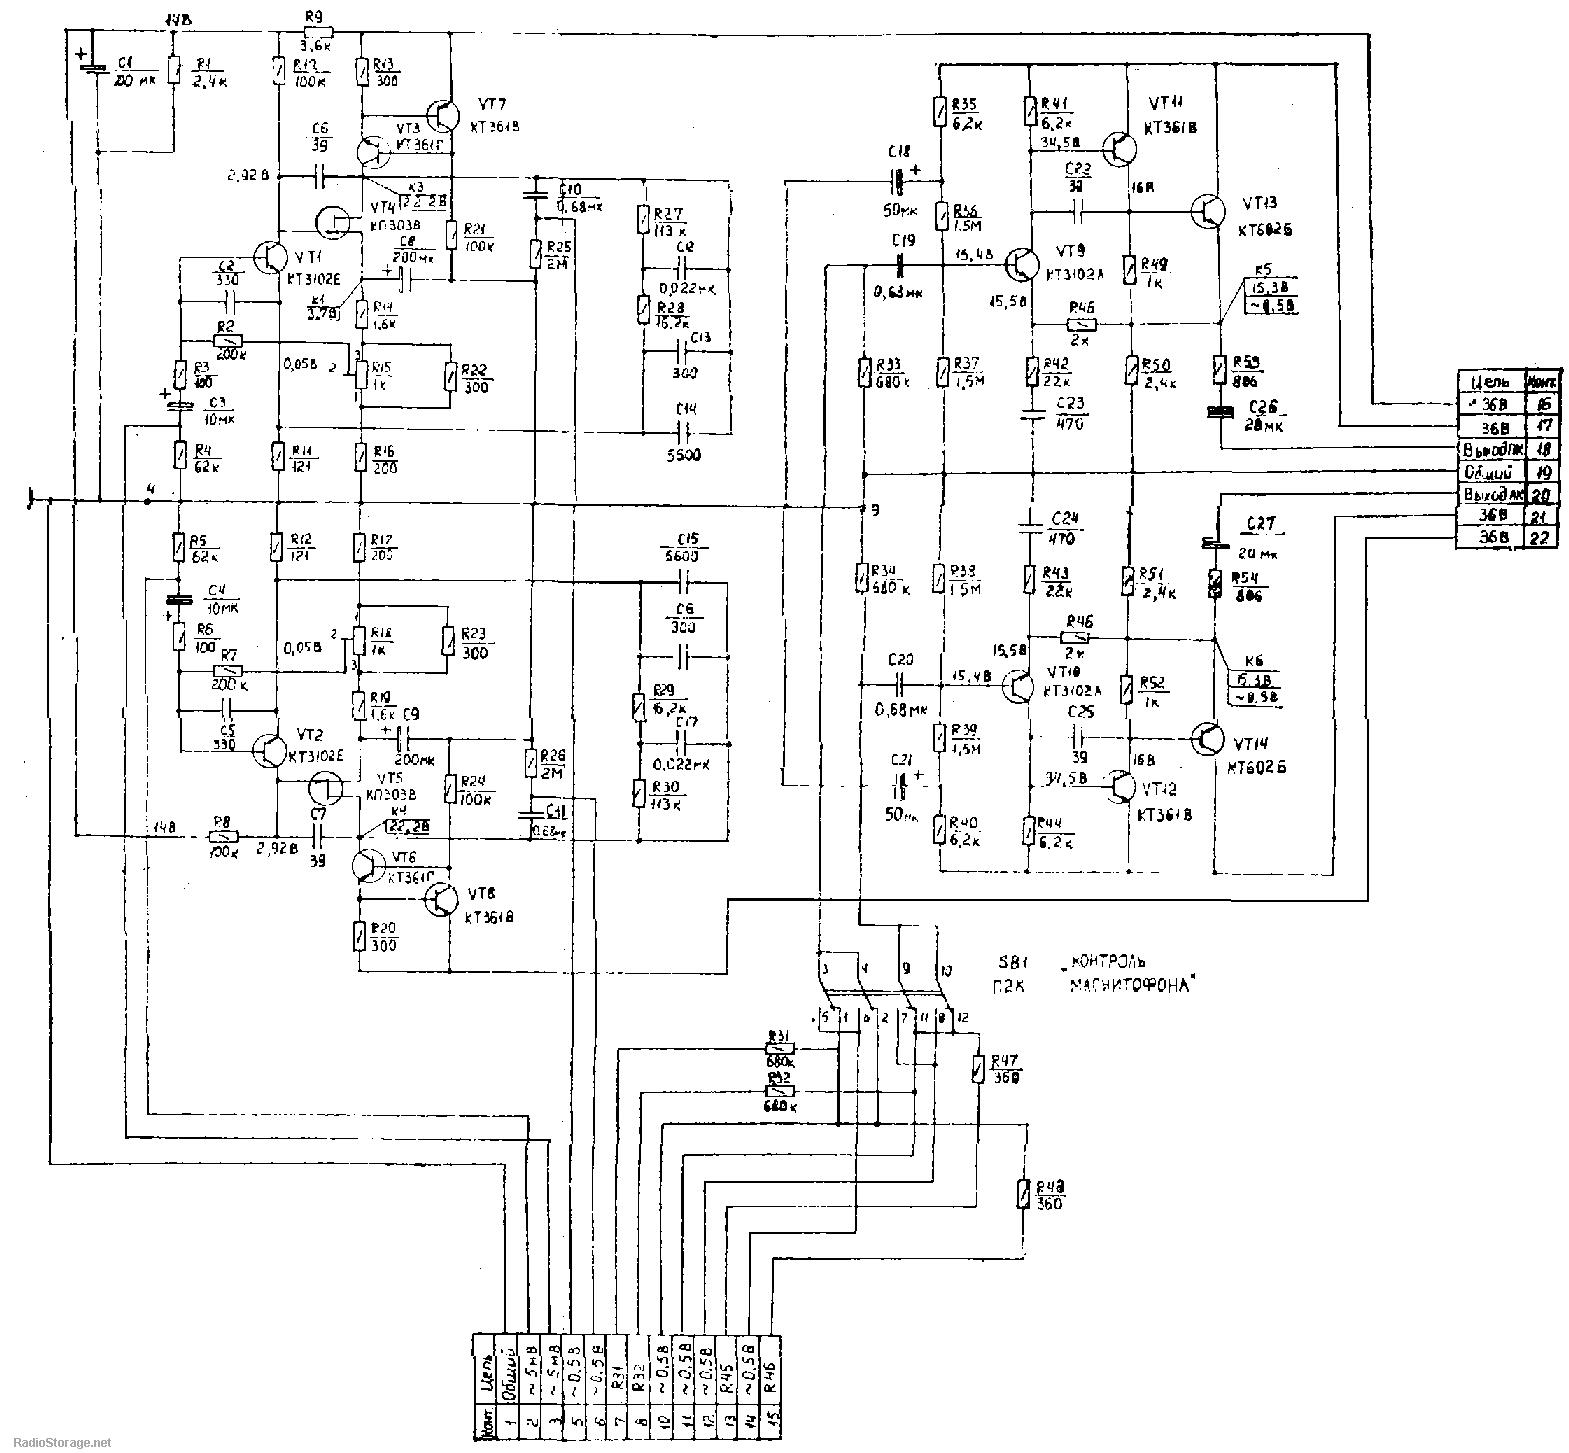 Схема усилителя бриг 001 стерео фото 740